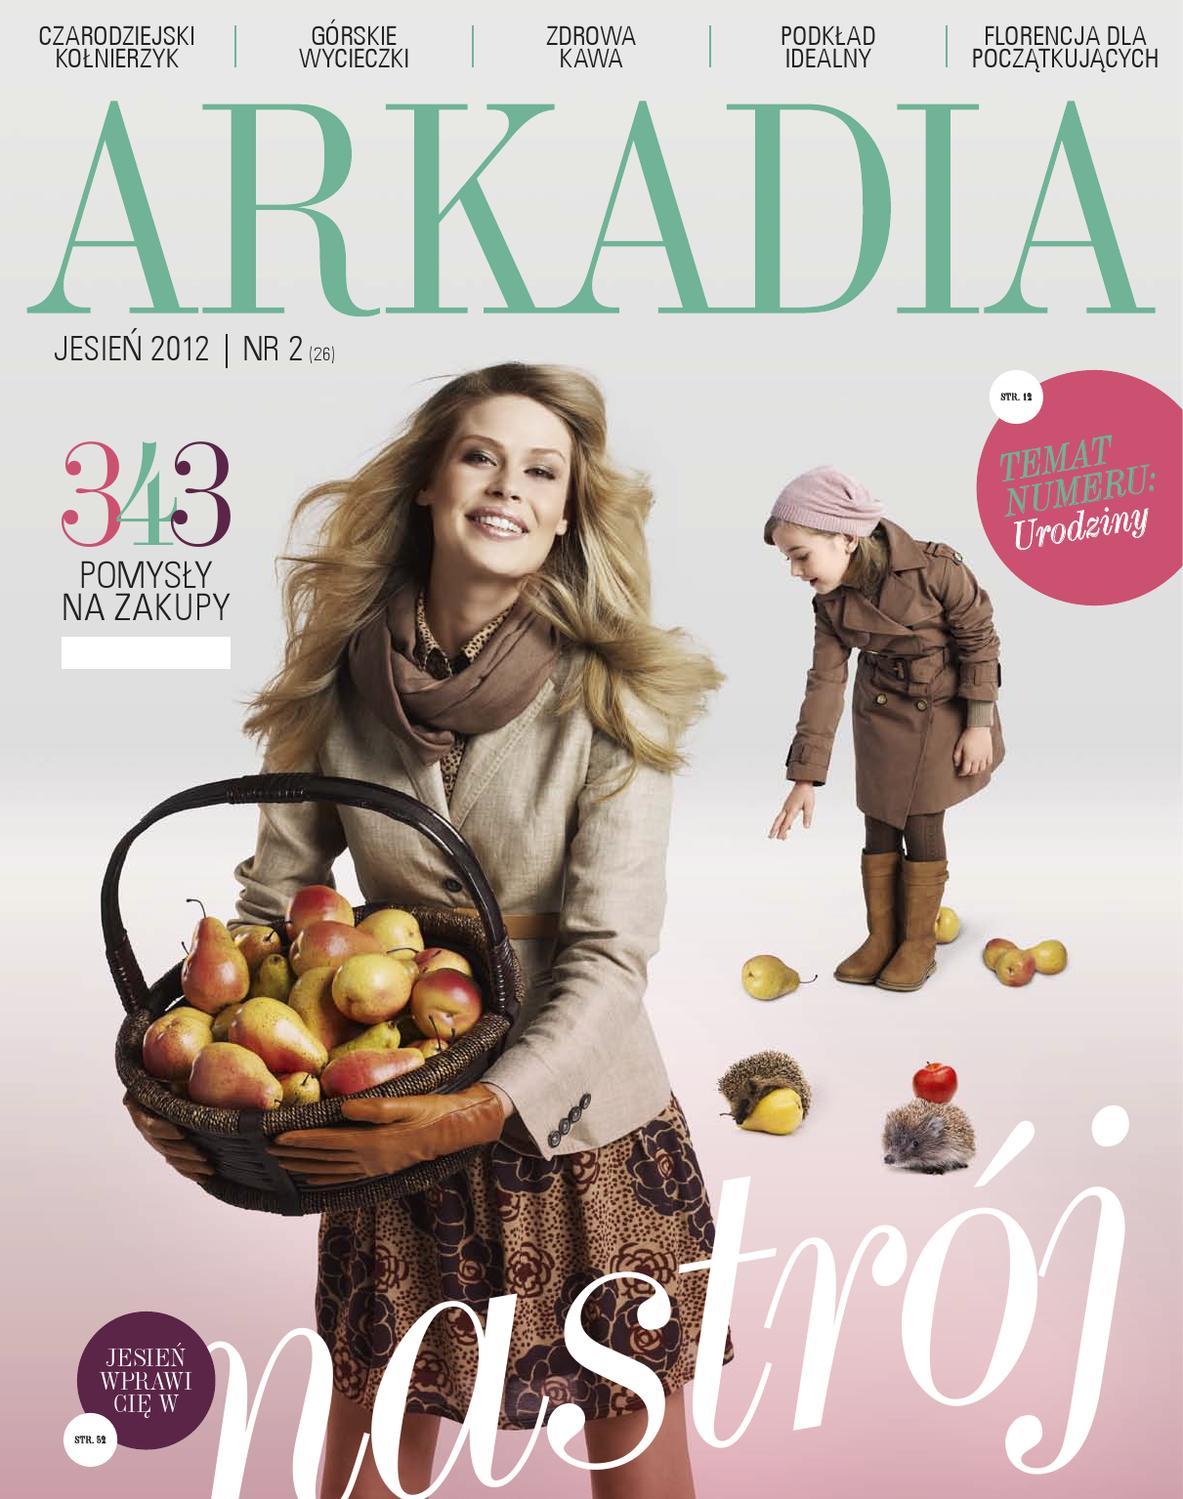 8e192f883129e ARKADIA #2 (26) 2012 by Dennis Wojda - issuu